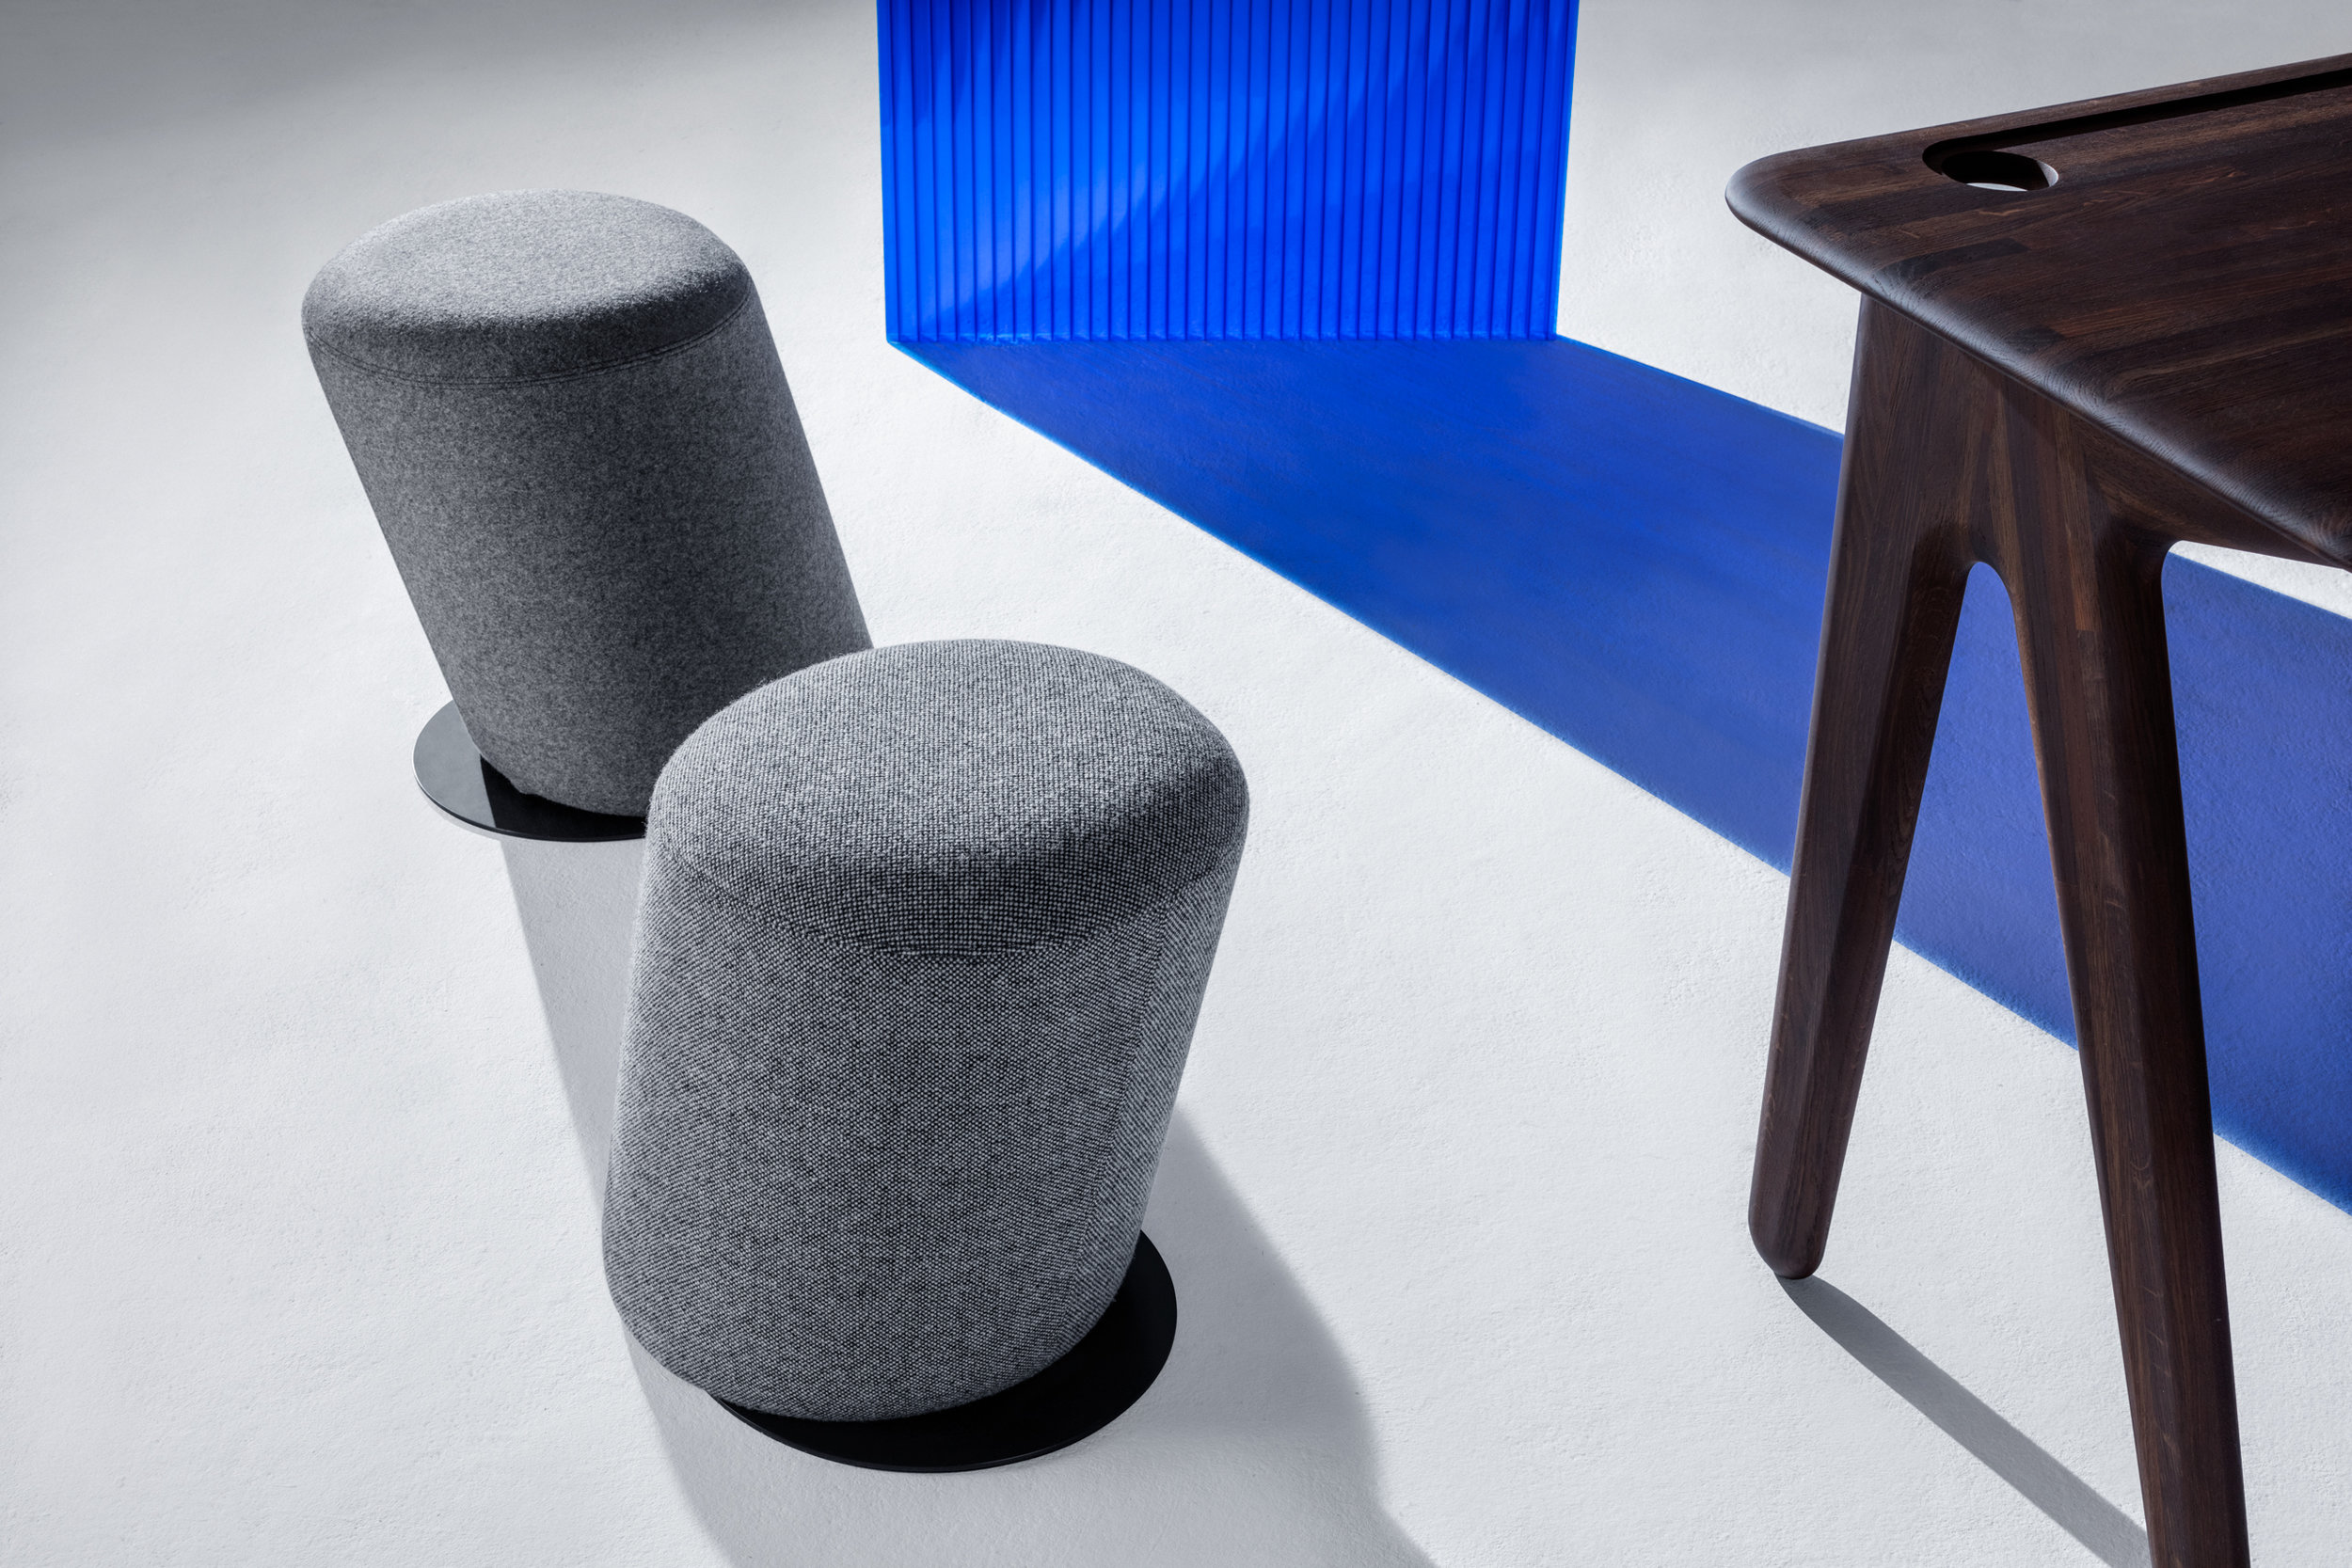 Slant stool